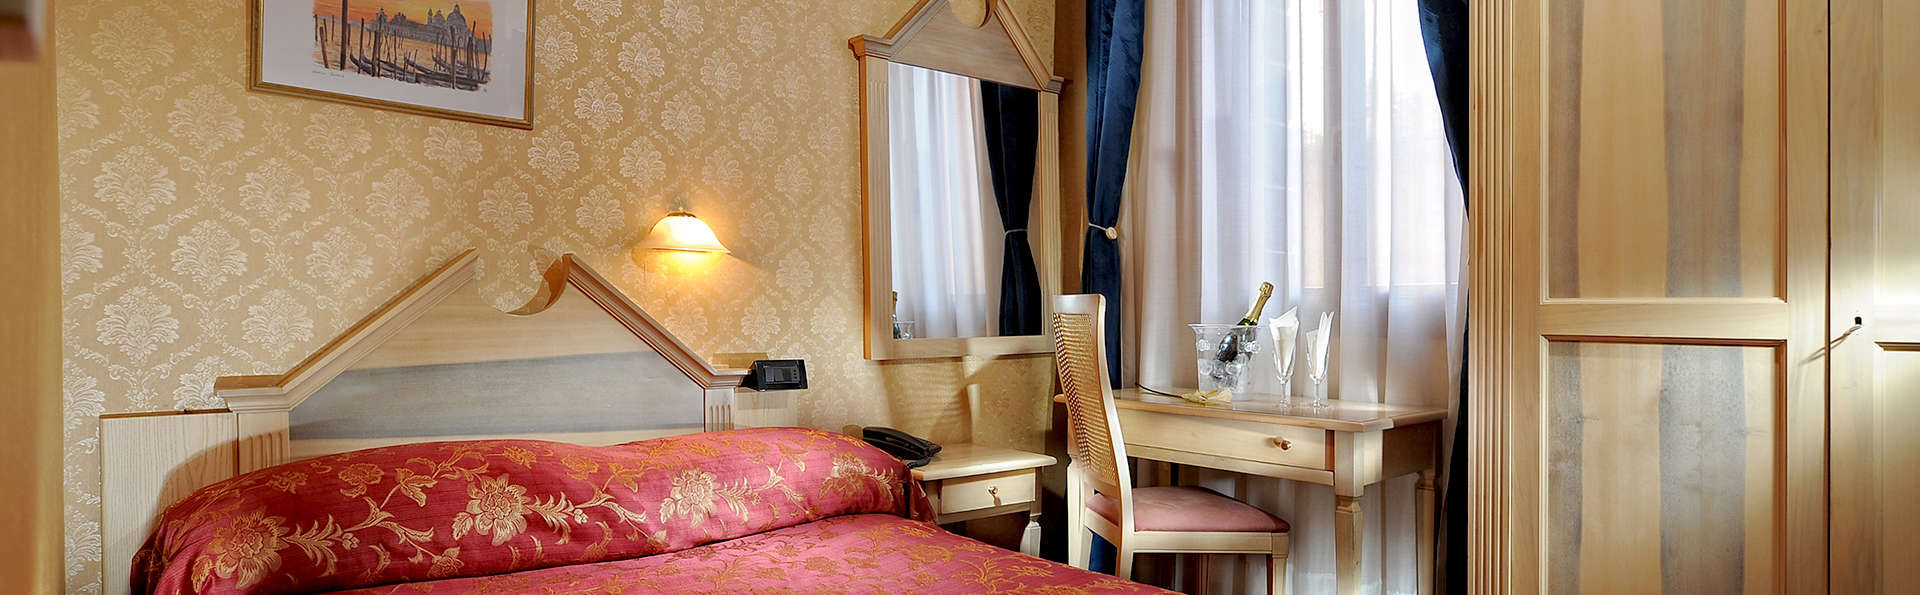 Hotel Tintoretto - Edit_Room4.jpg